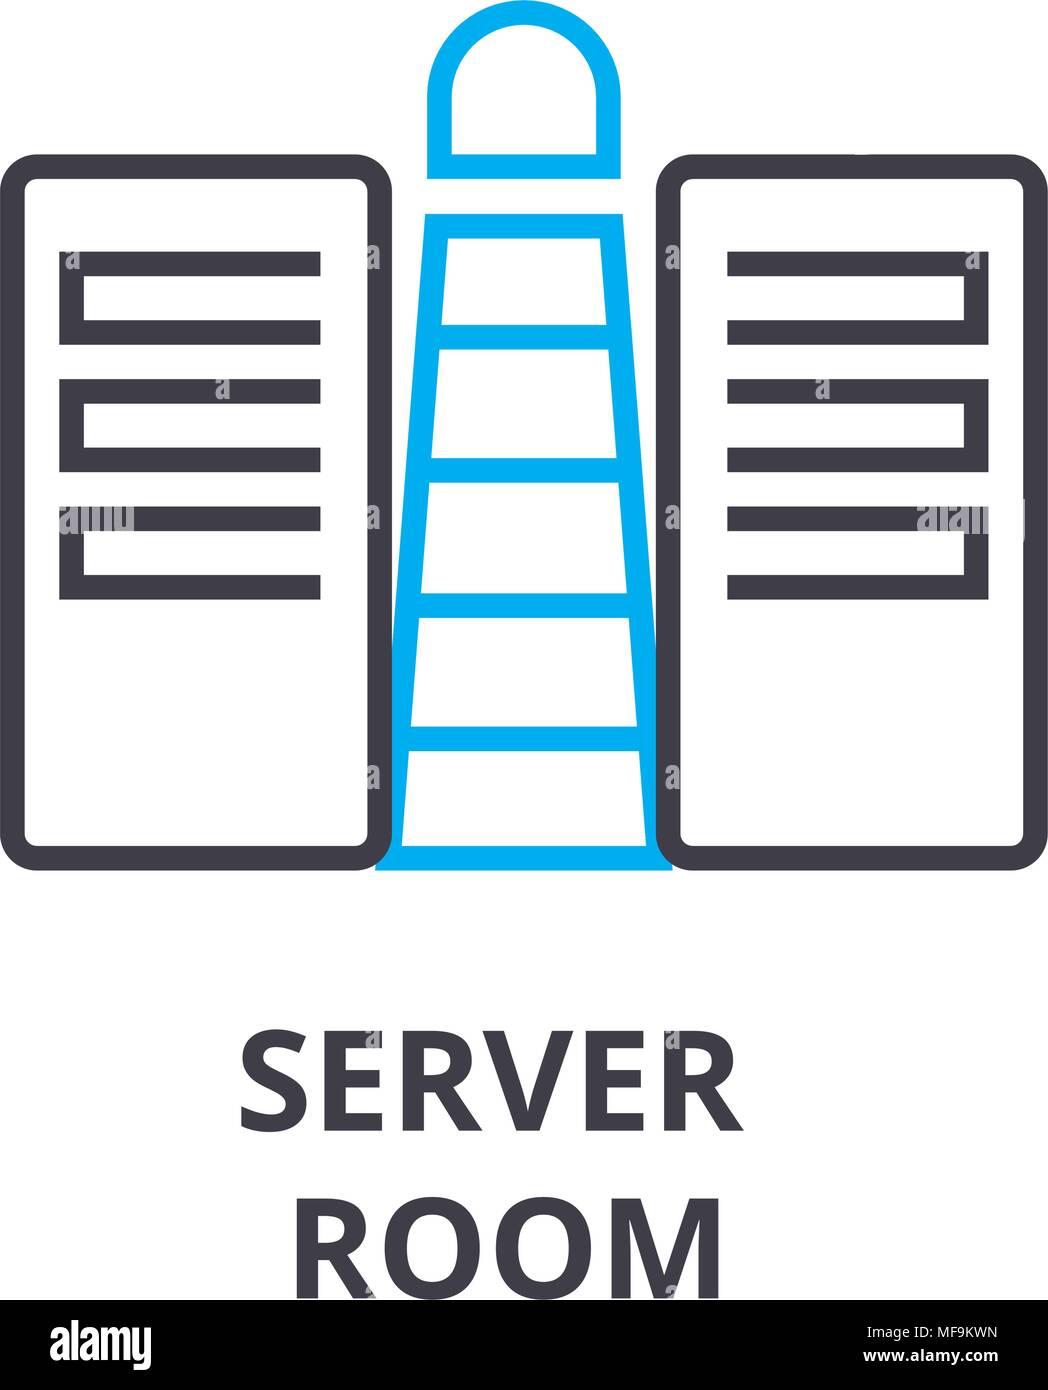 server room thin line icon, sign, symbol, illustation